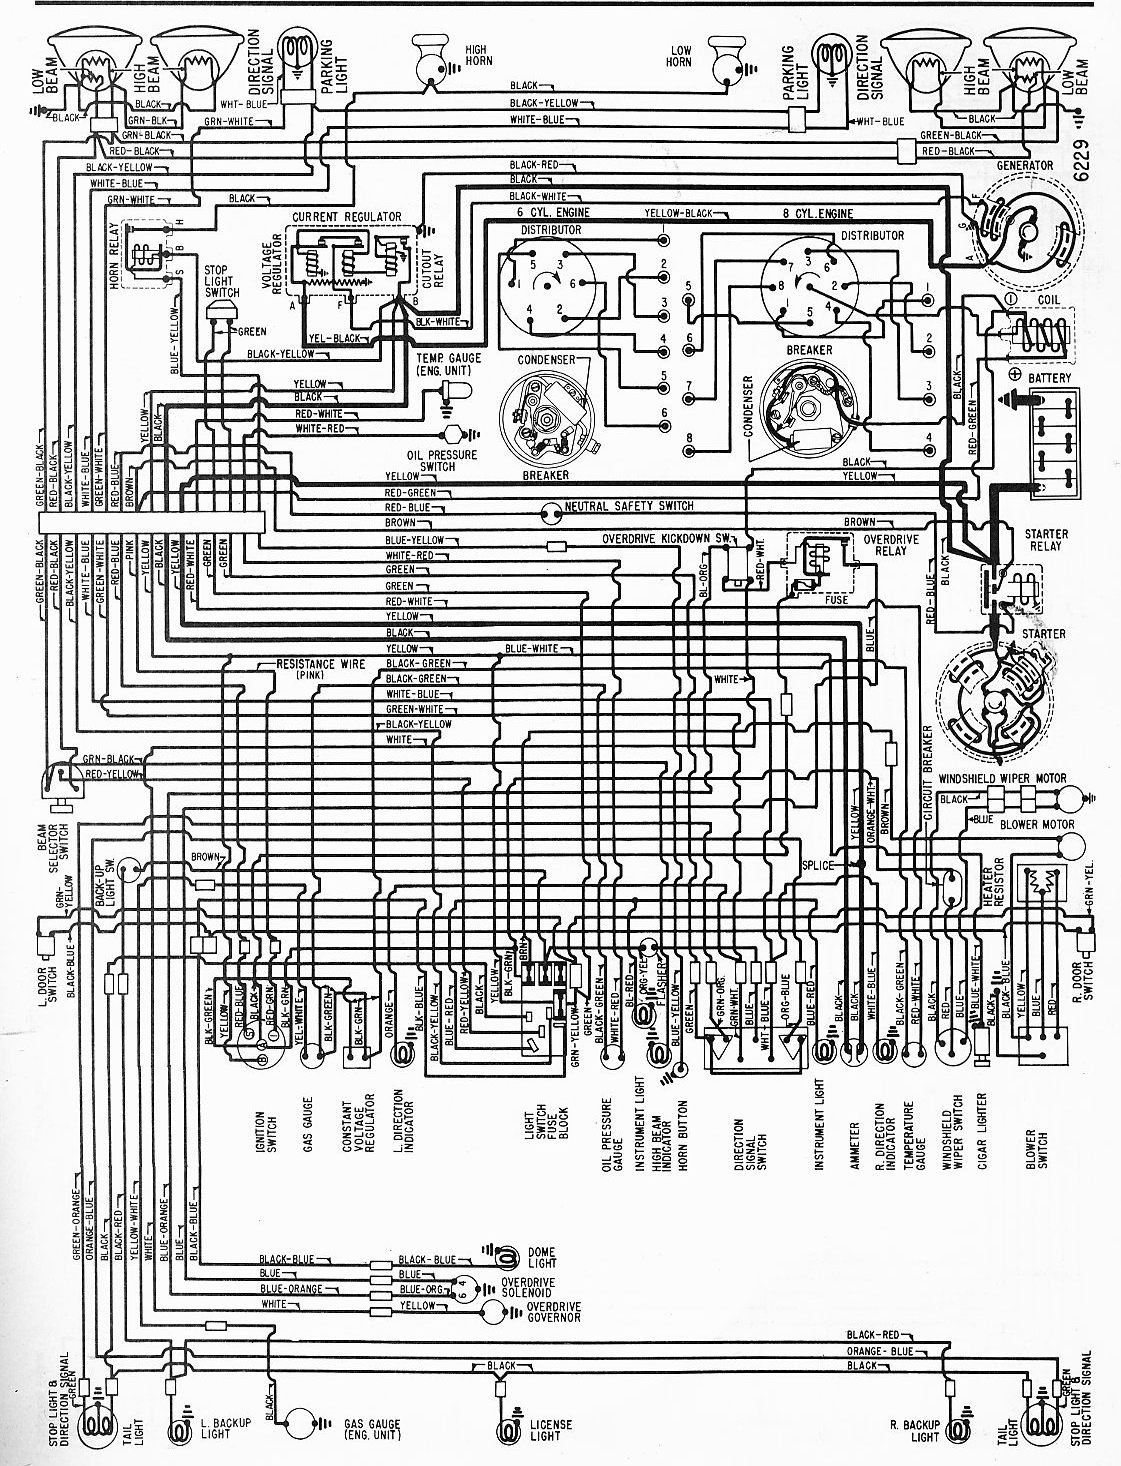 1970 Chevrolet Wiring Diagram